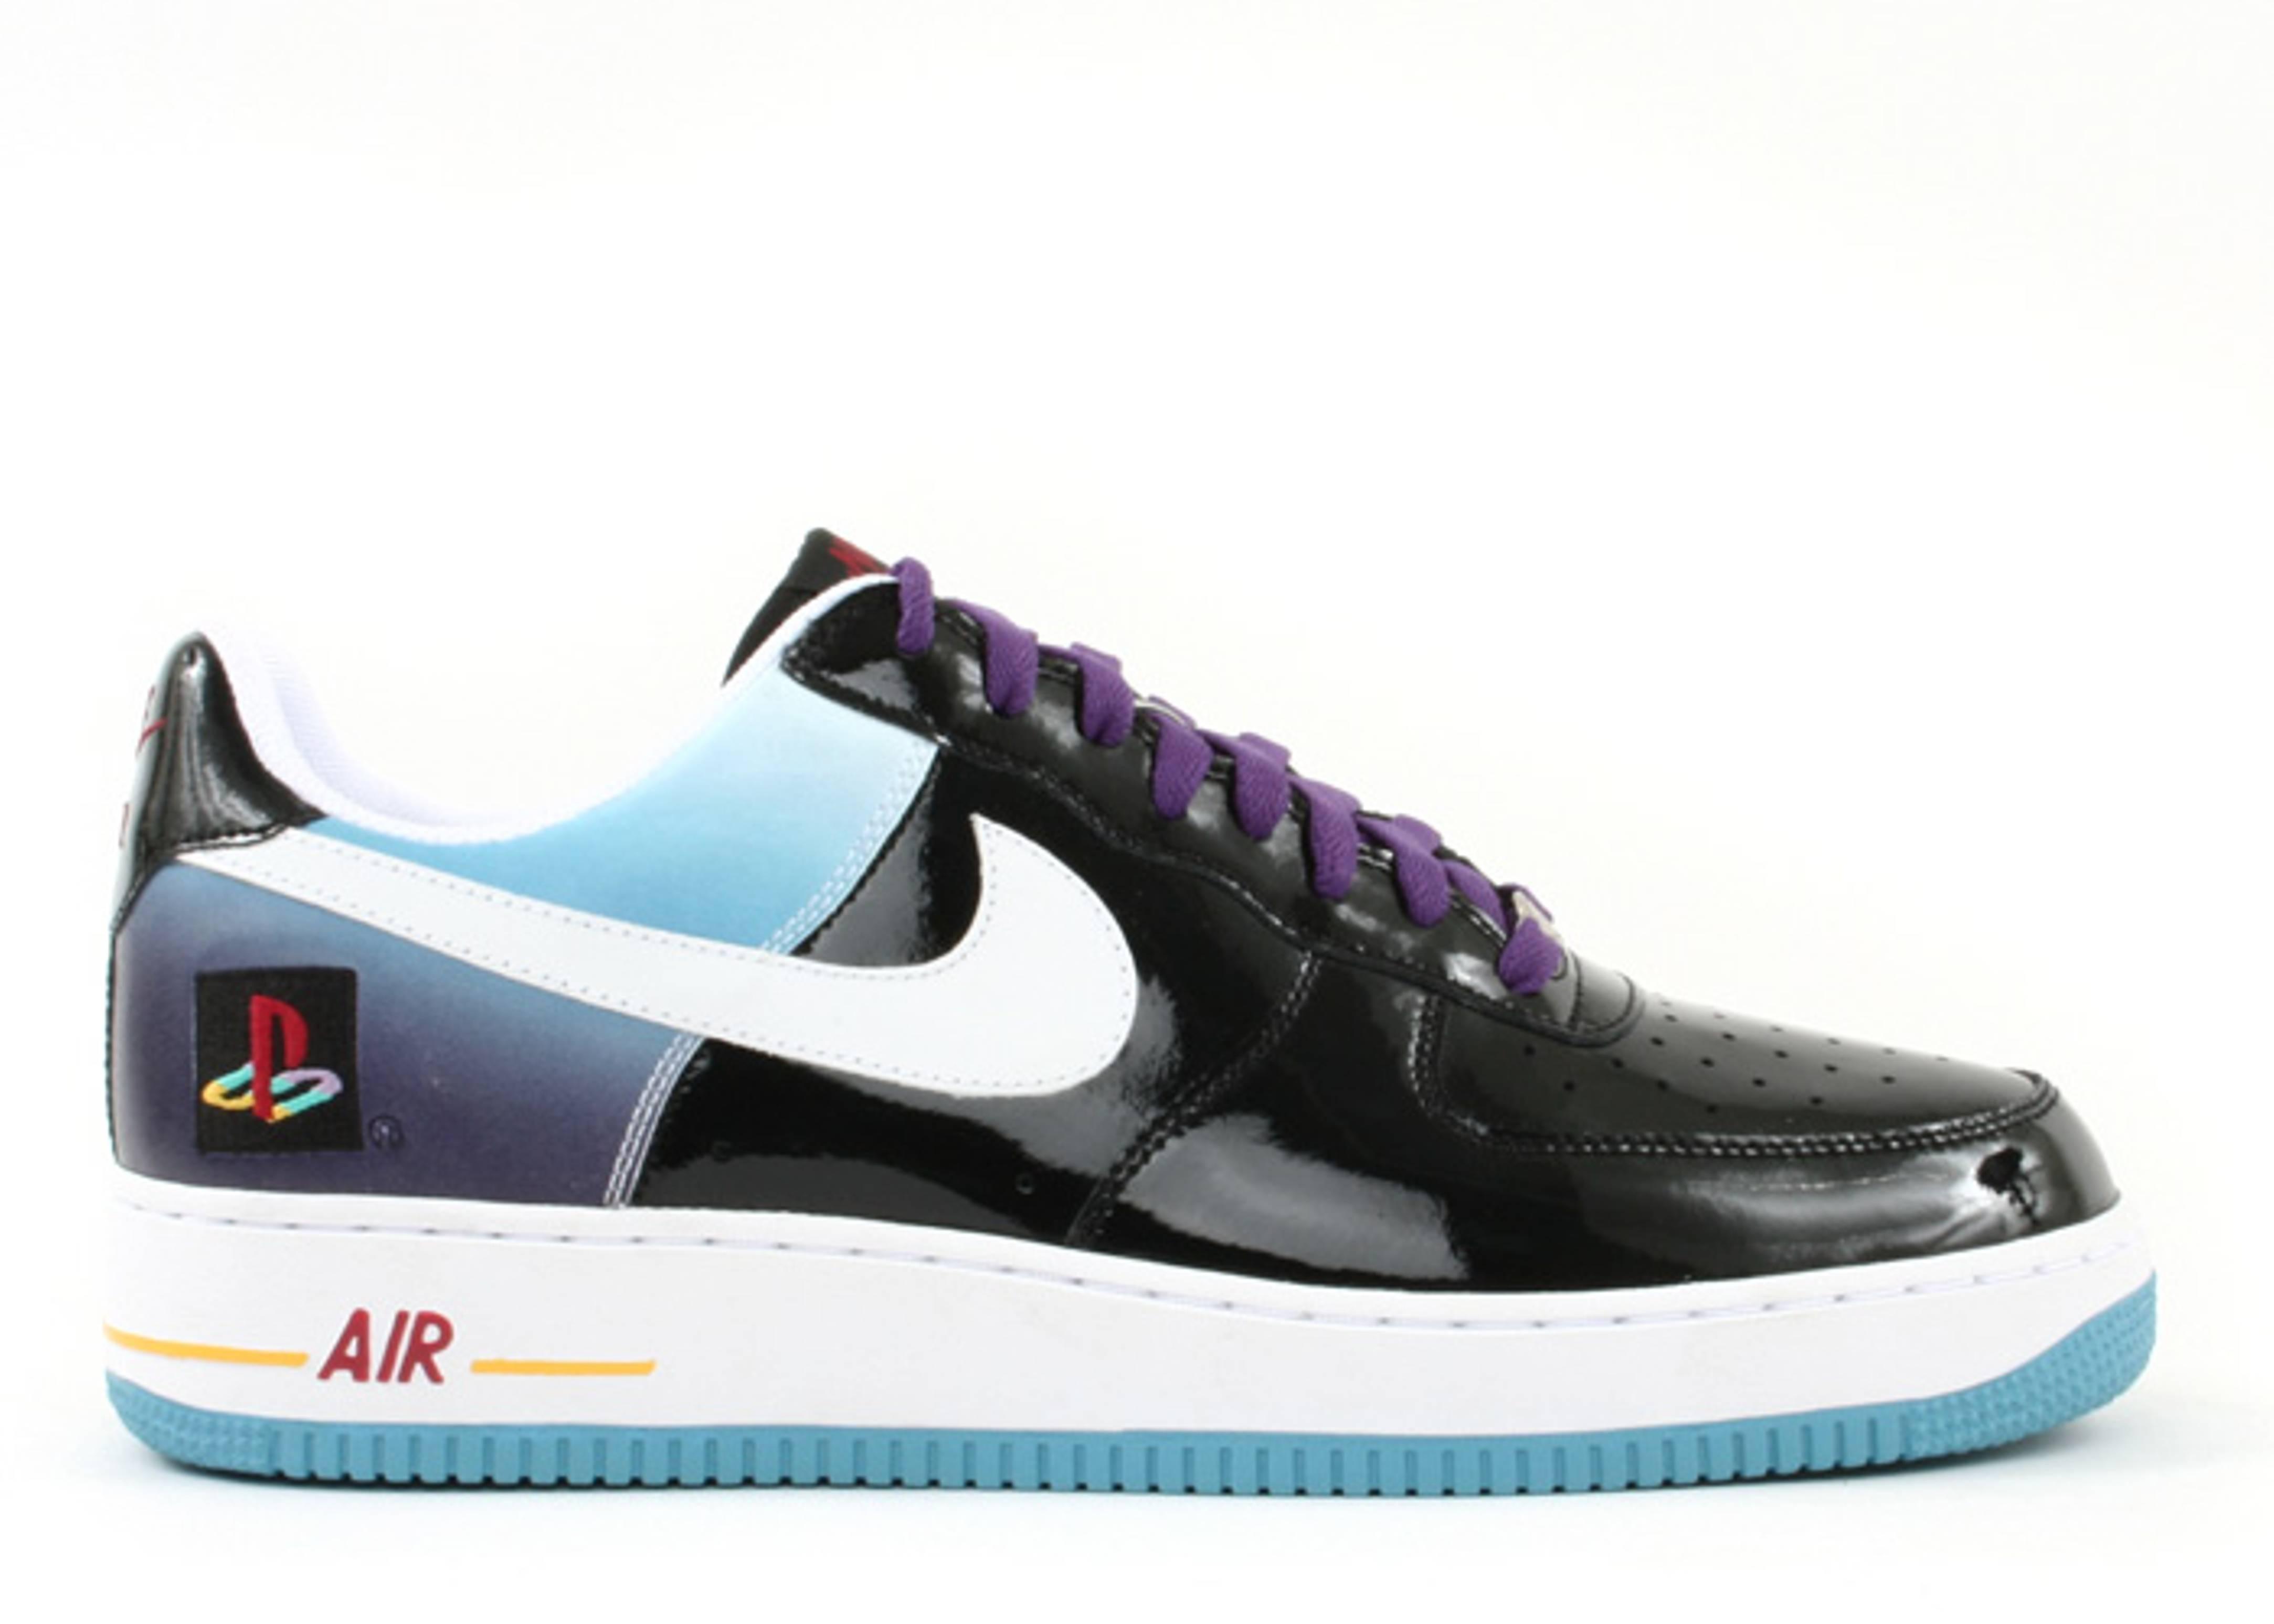 Air Force 1 Low 'Playstation' Promo - Nike - BMK067 M6 C1 - black ...